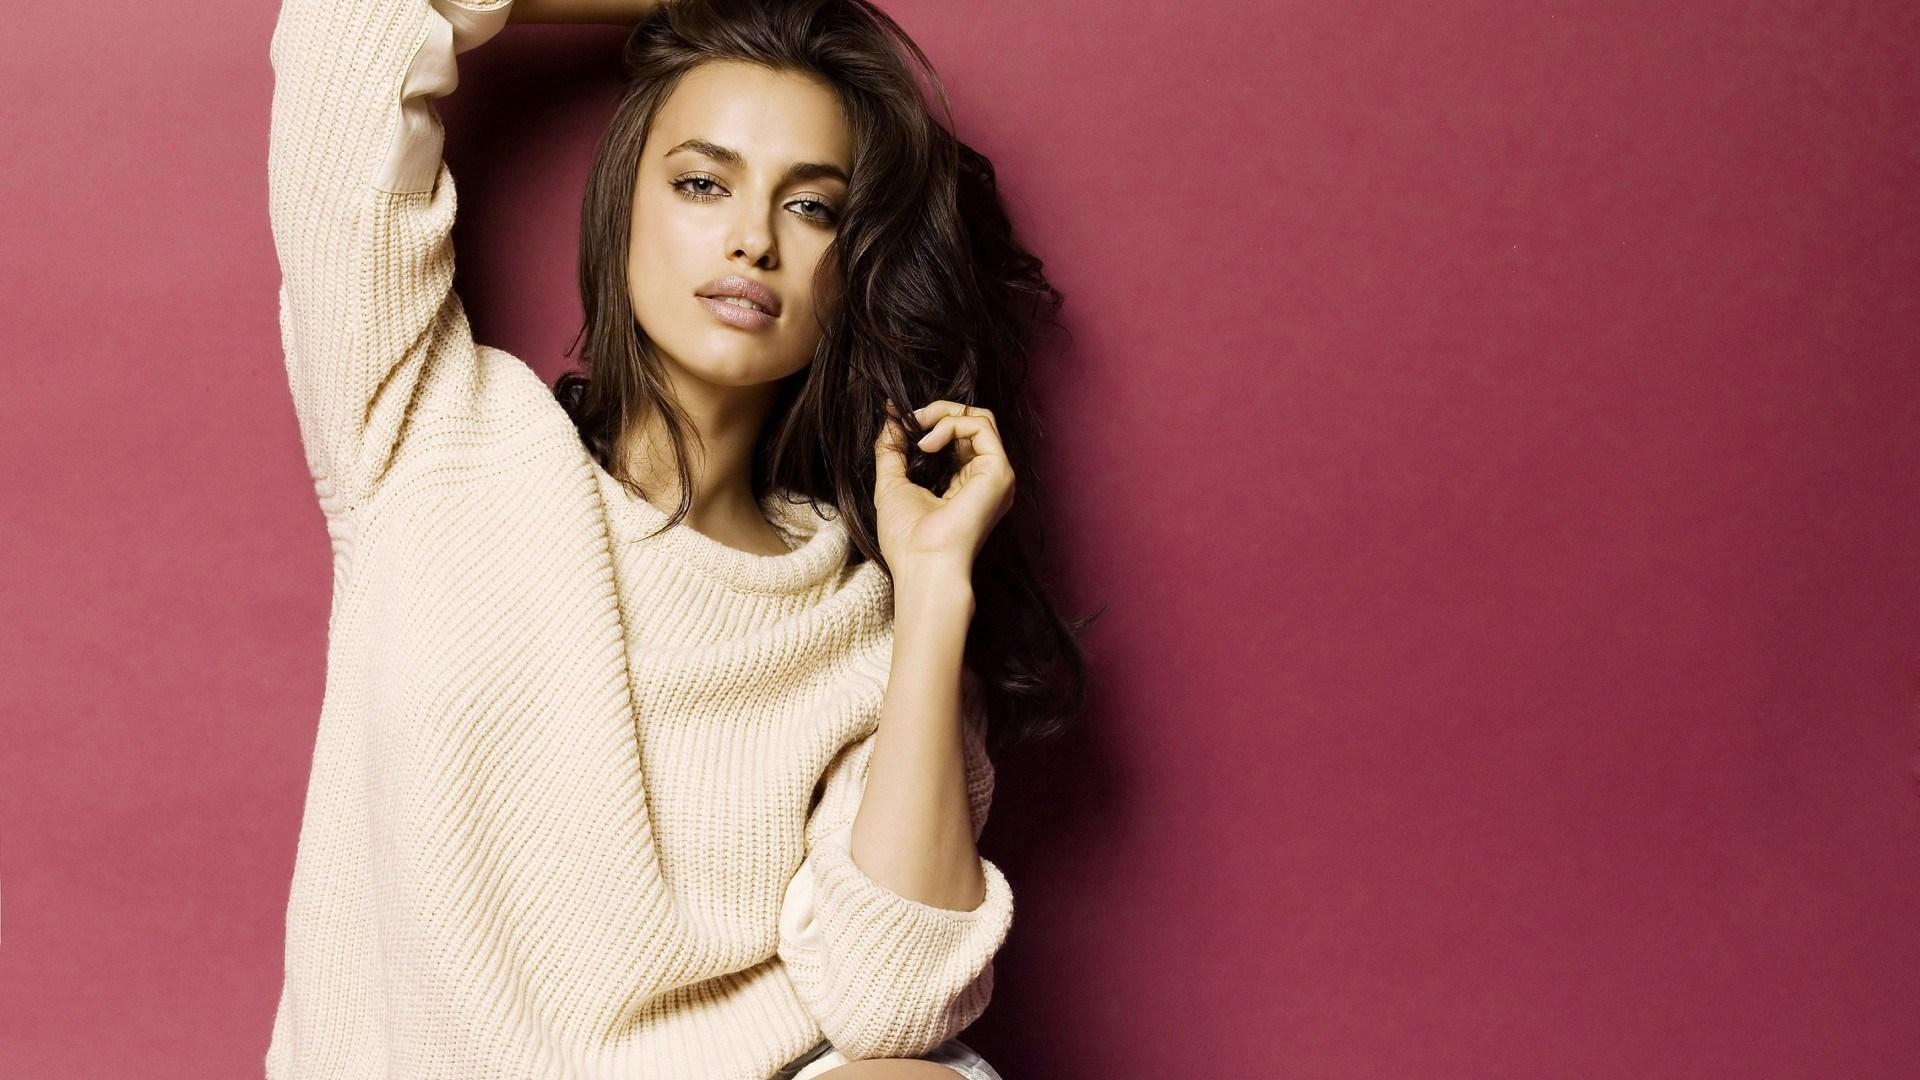 Irina Shayk Irina Sheik Beauty Model Girl